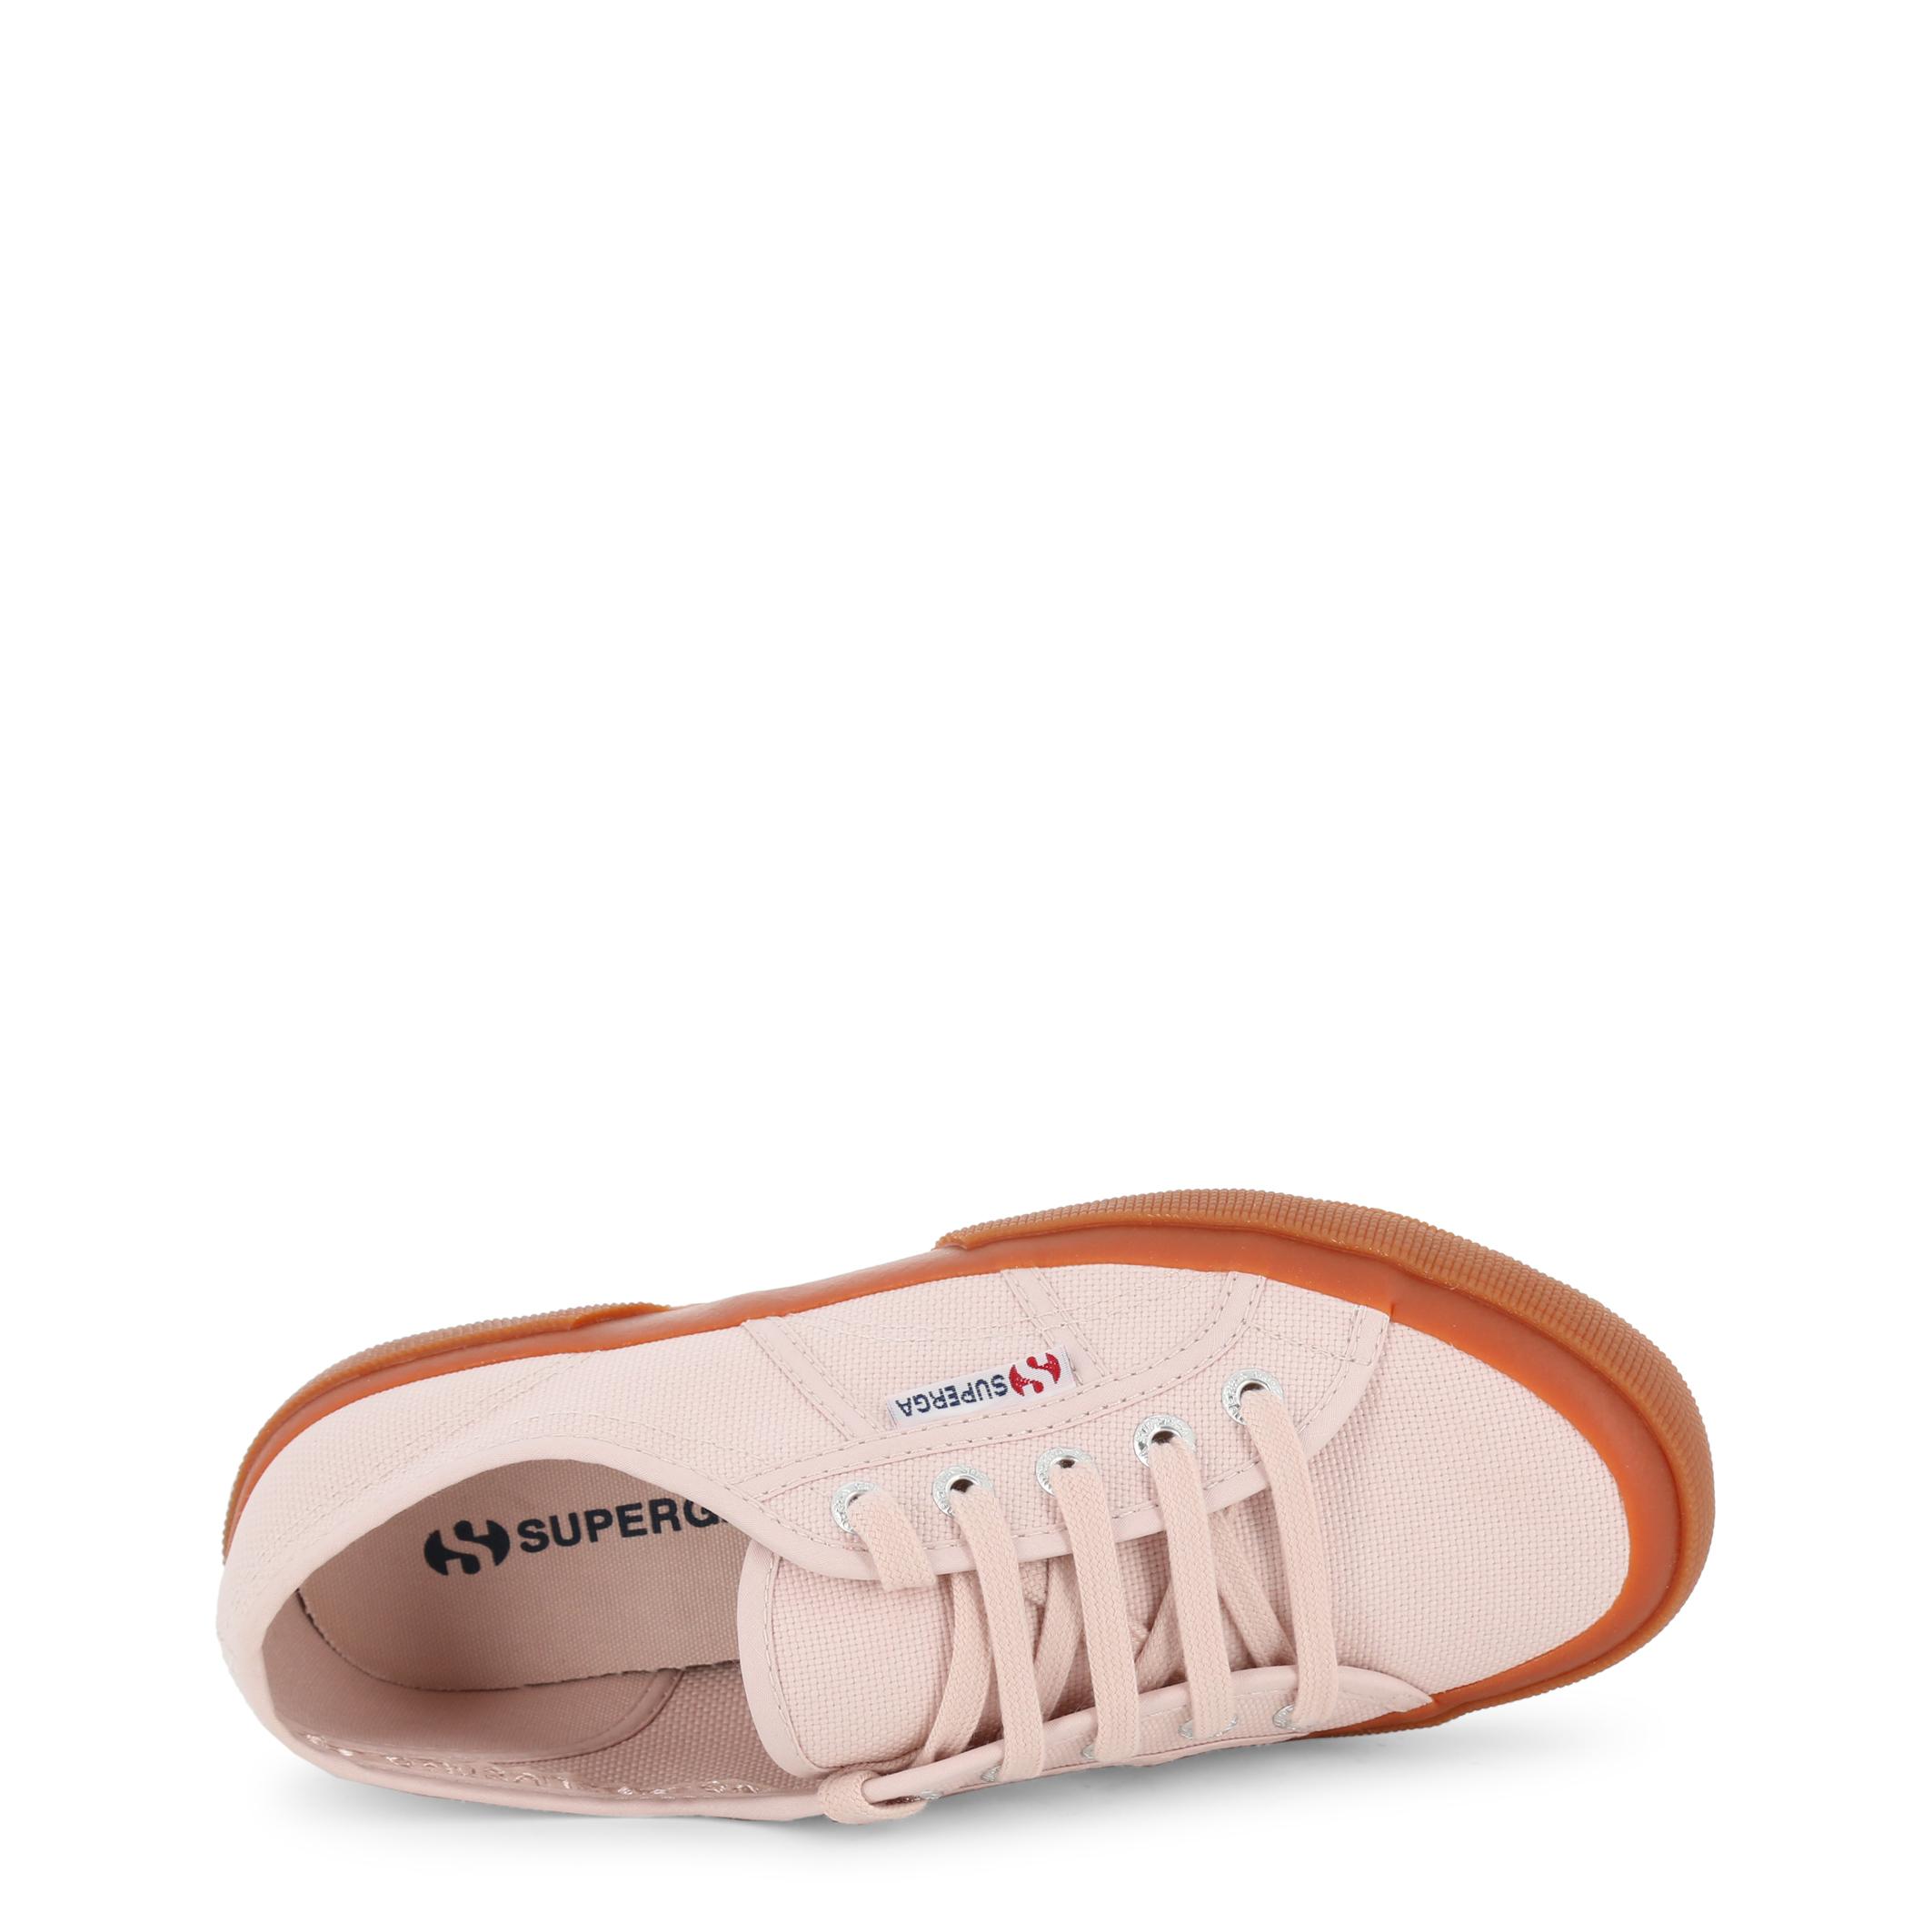 Chaussures de ville  Superga 2750-COTU-CLASSIC pink